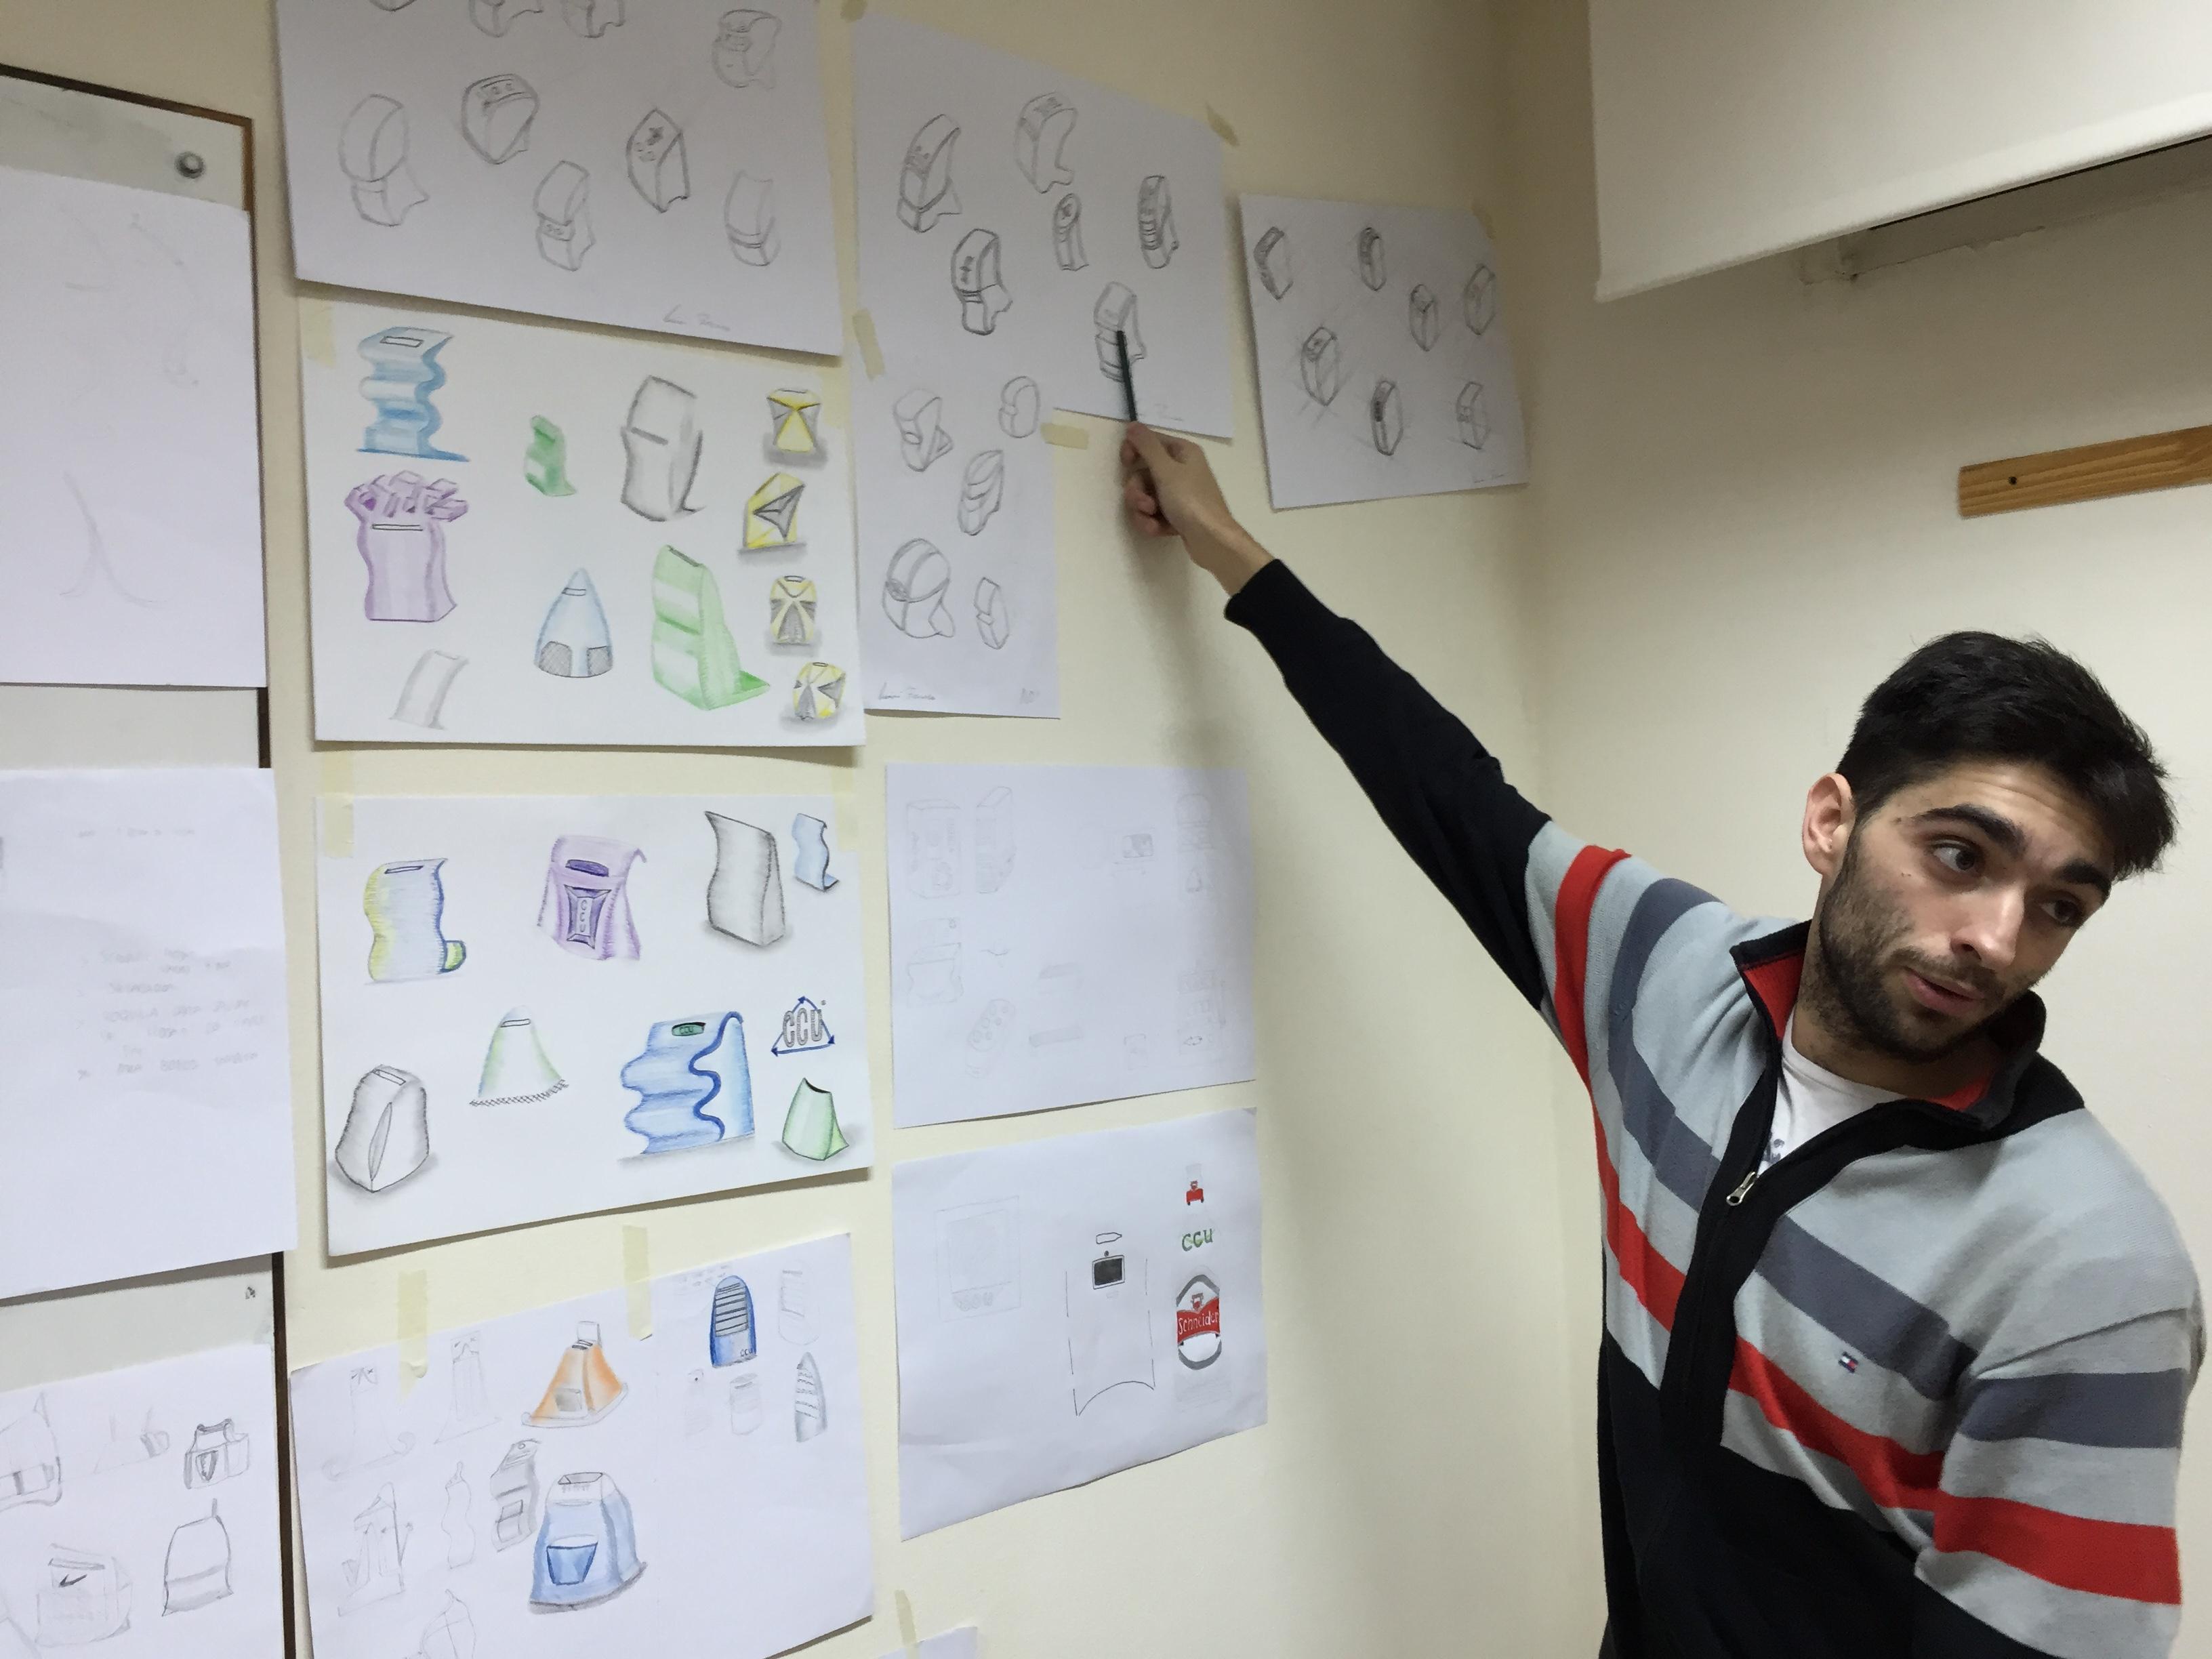 2 - diseño conceptual